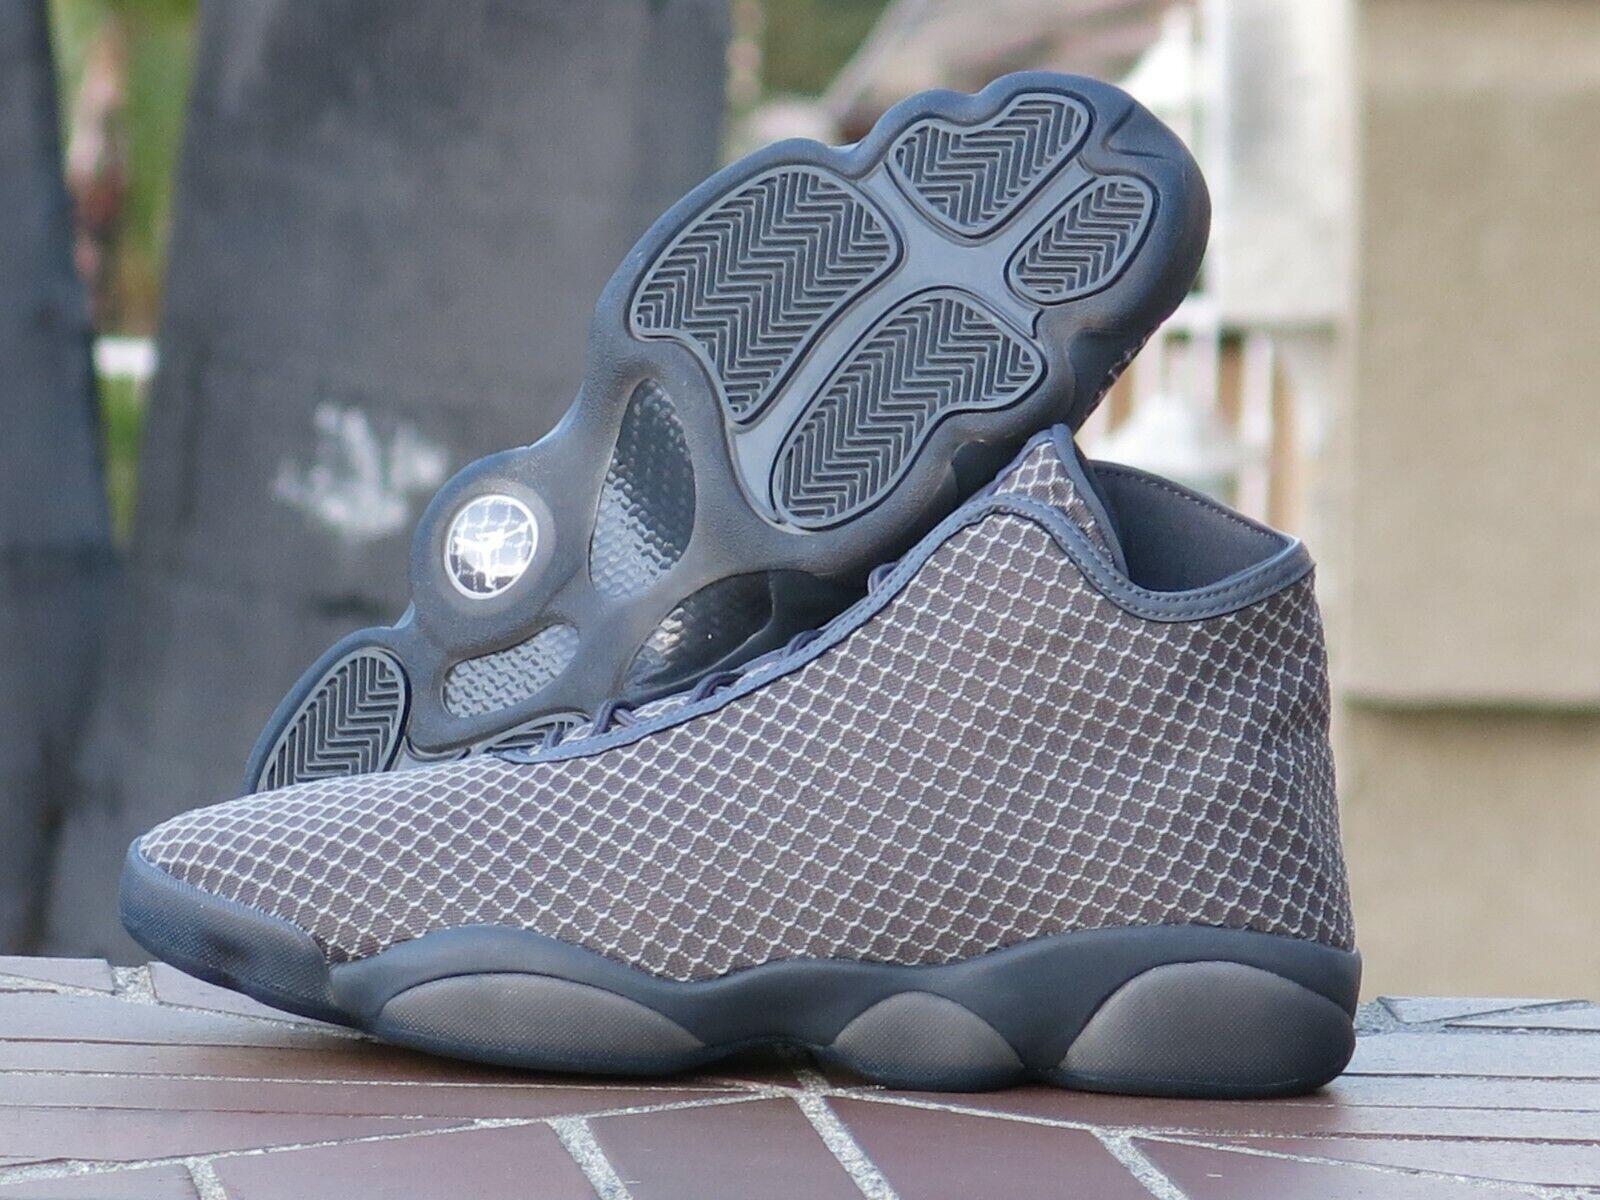 Nike Jordan Horizon Men 65533;s Basketball scarpe da  ginnastica 823581 -003  vendendo bene in tutto il mondo